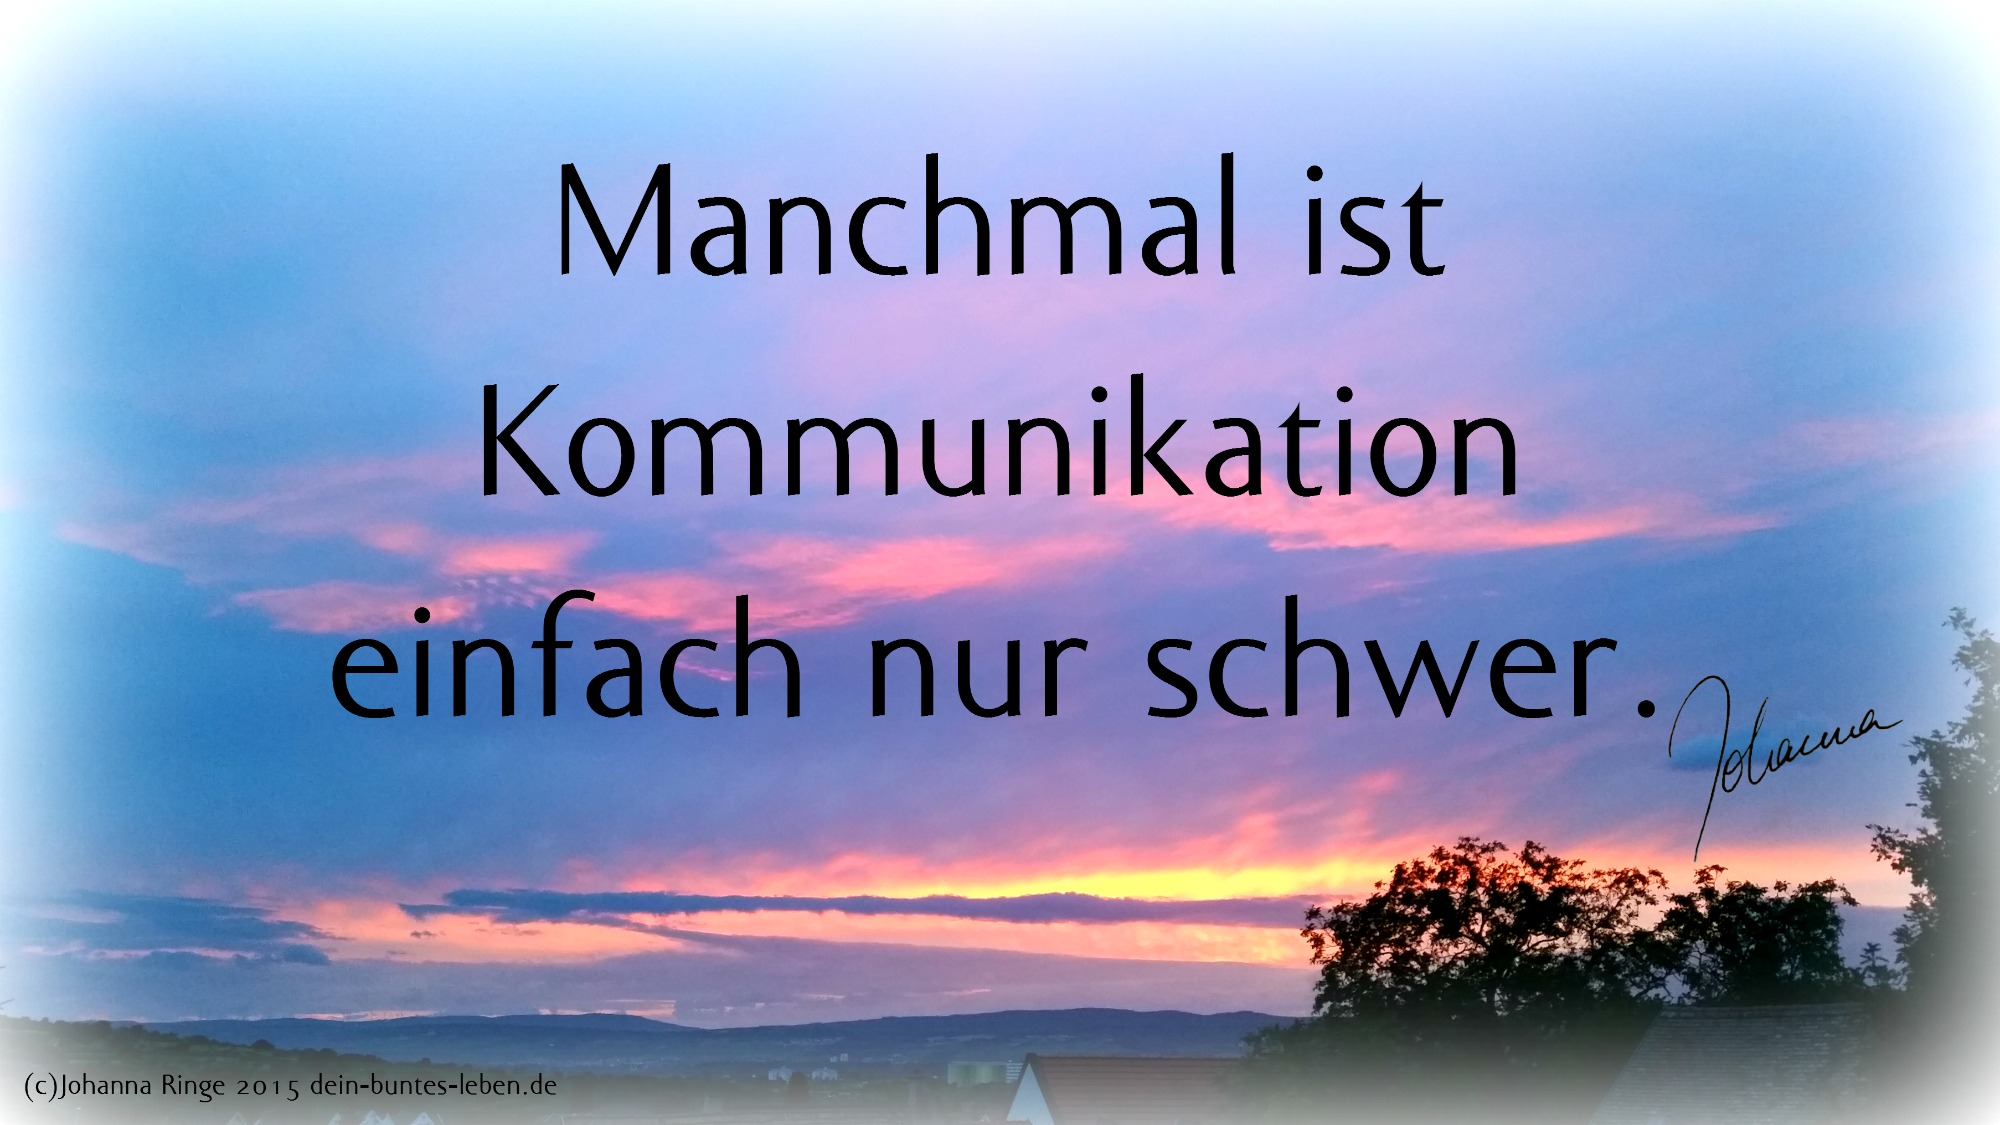 Schwere Kommunikation (c)Johanna Ringe 2015 www.dein-buntes-leben.de